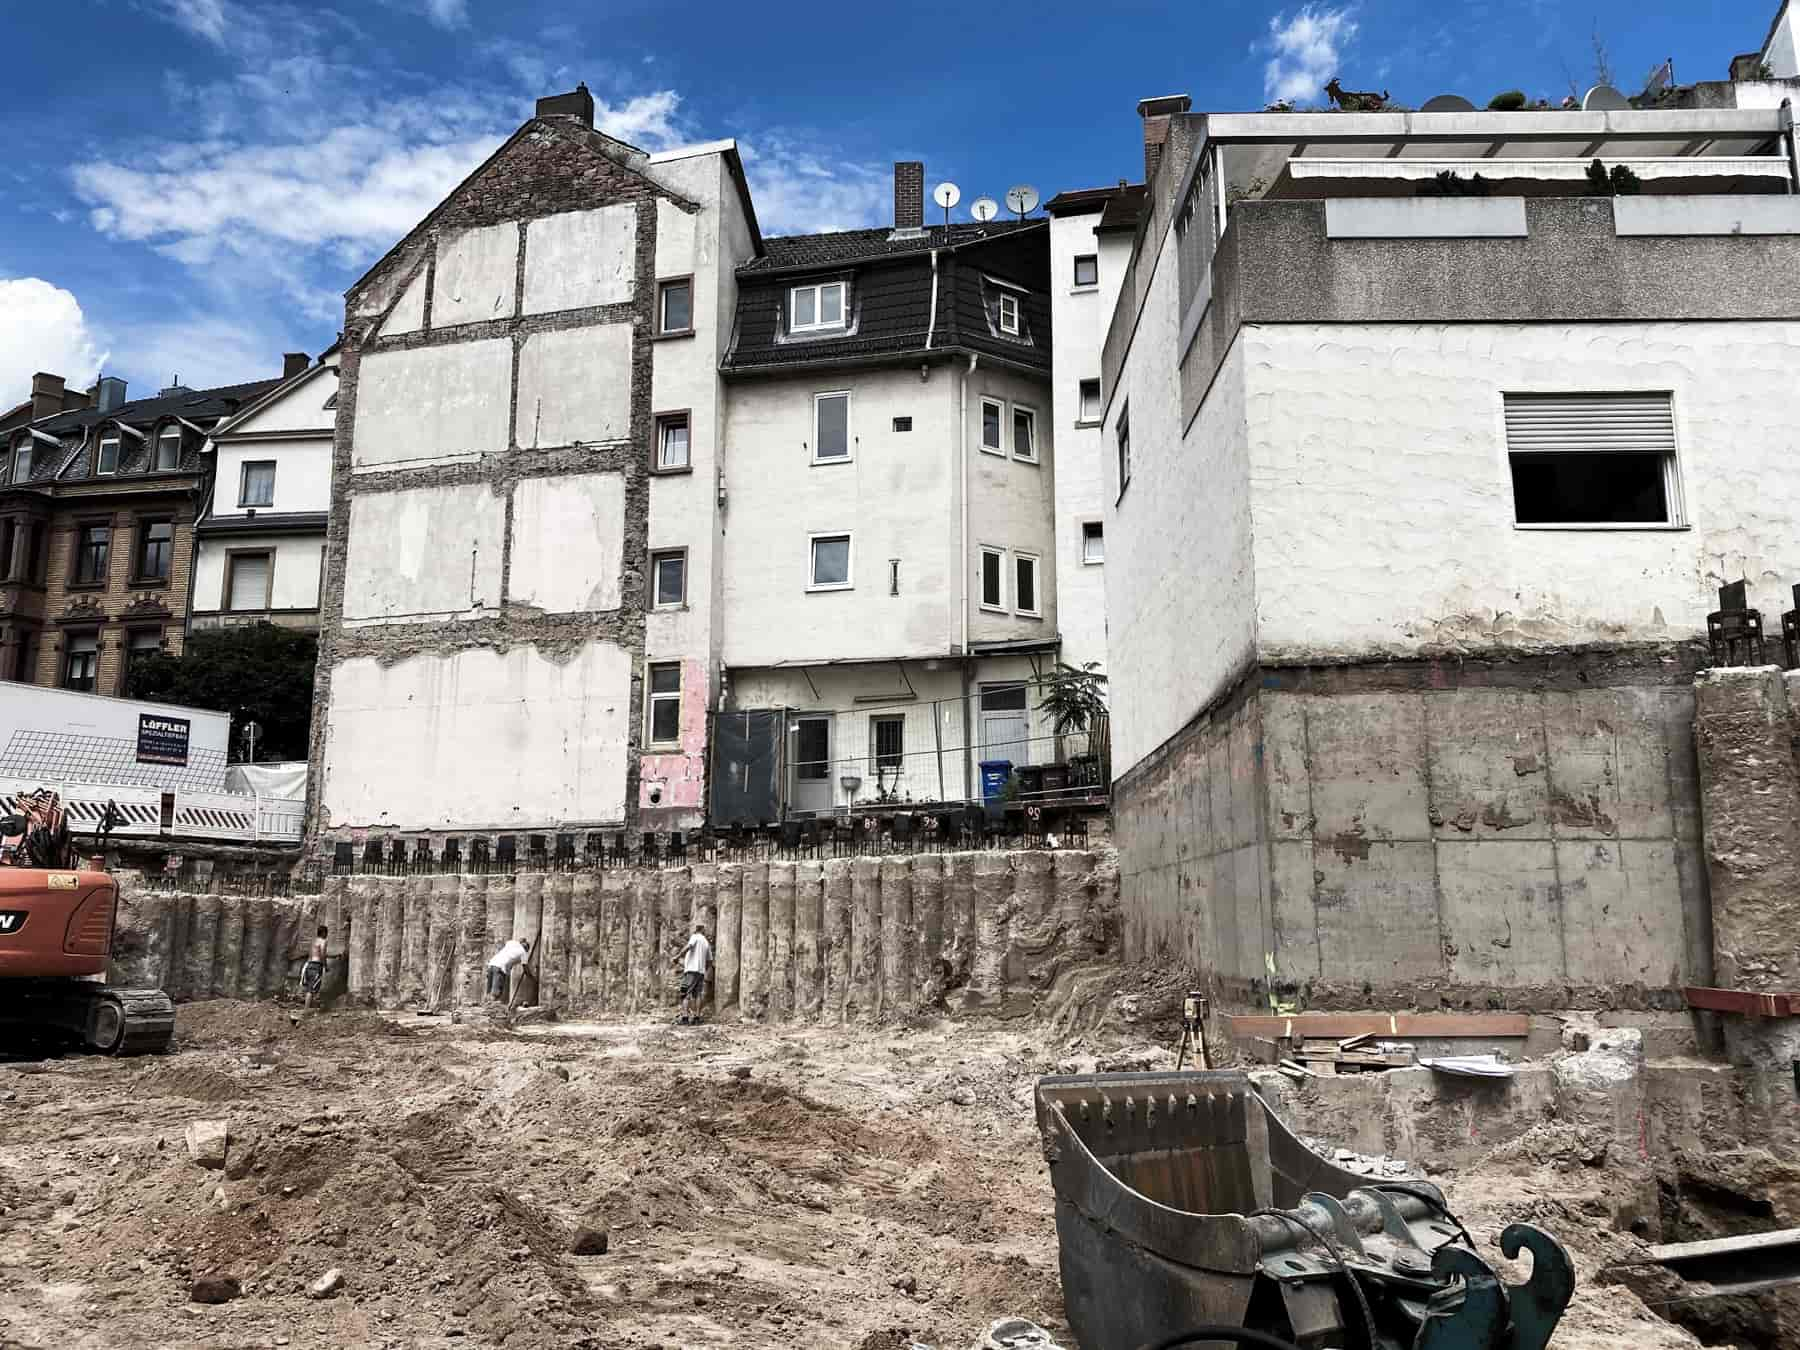 Ingenieurbüro Nebel - Ingenieurbüro Mespelbrunn - Projekt - Erbsengasse Aschaffenburg